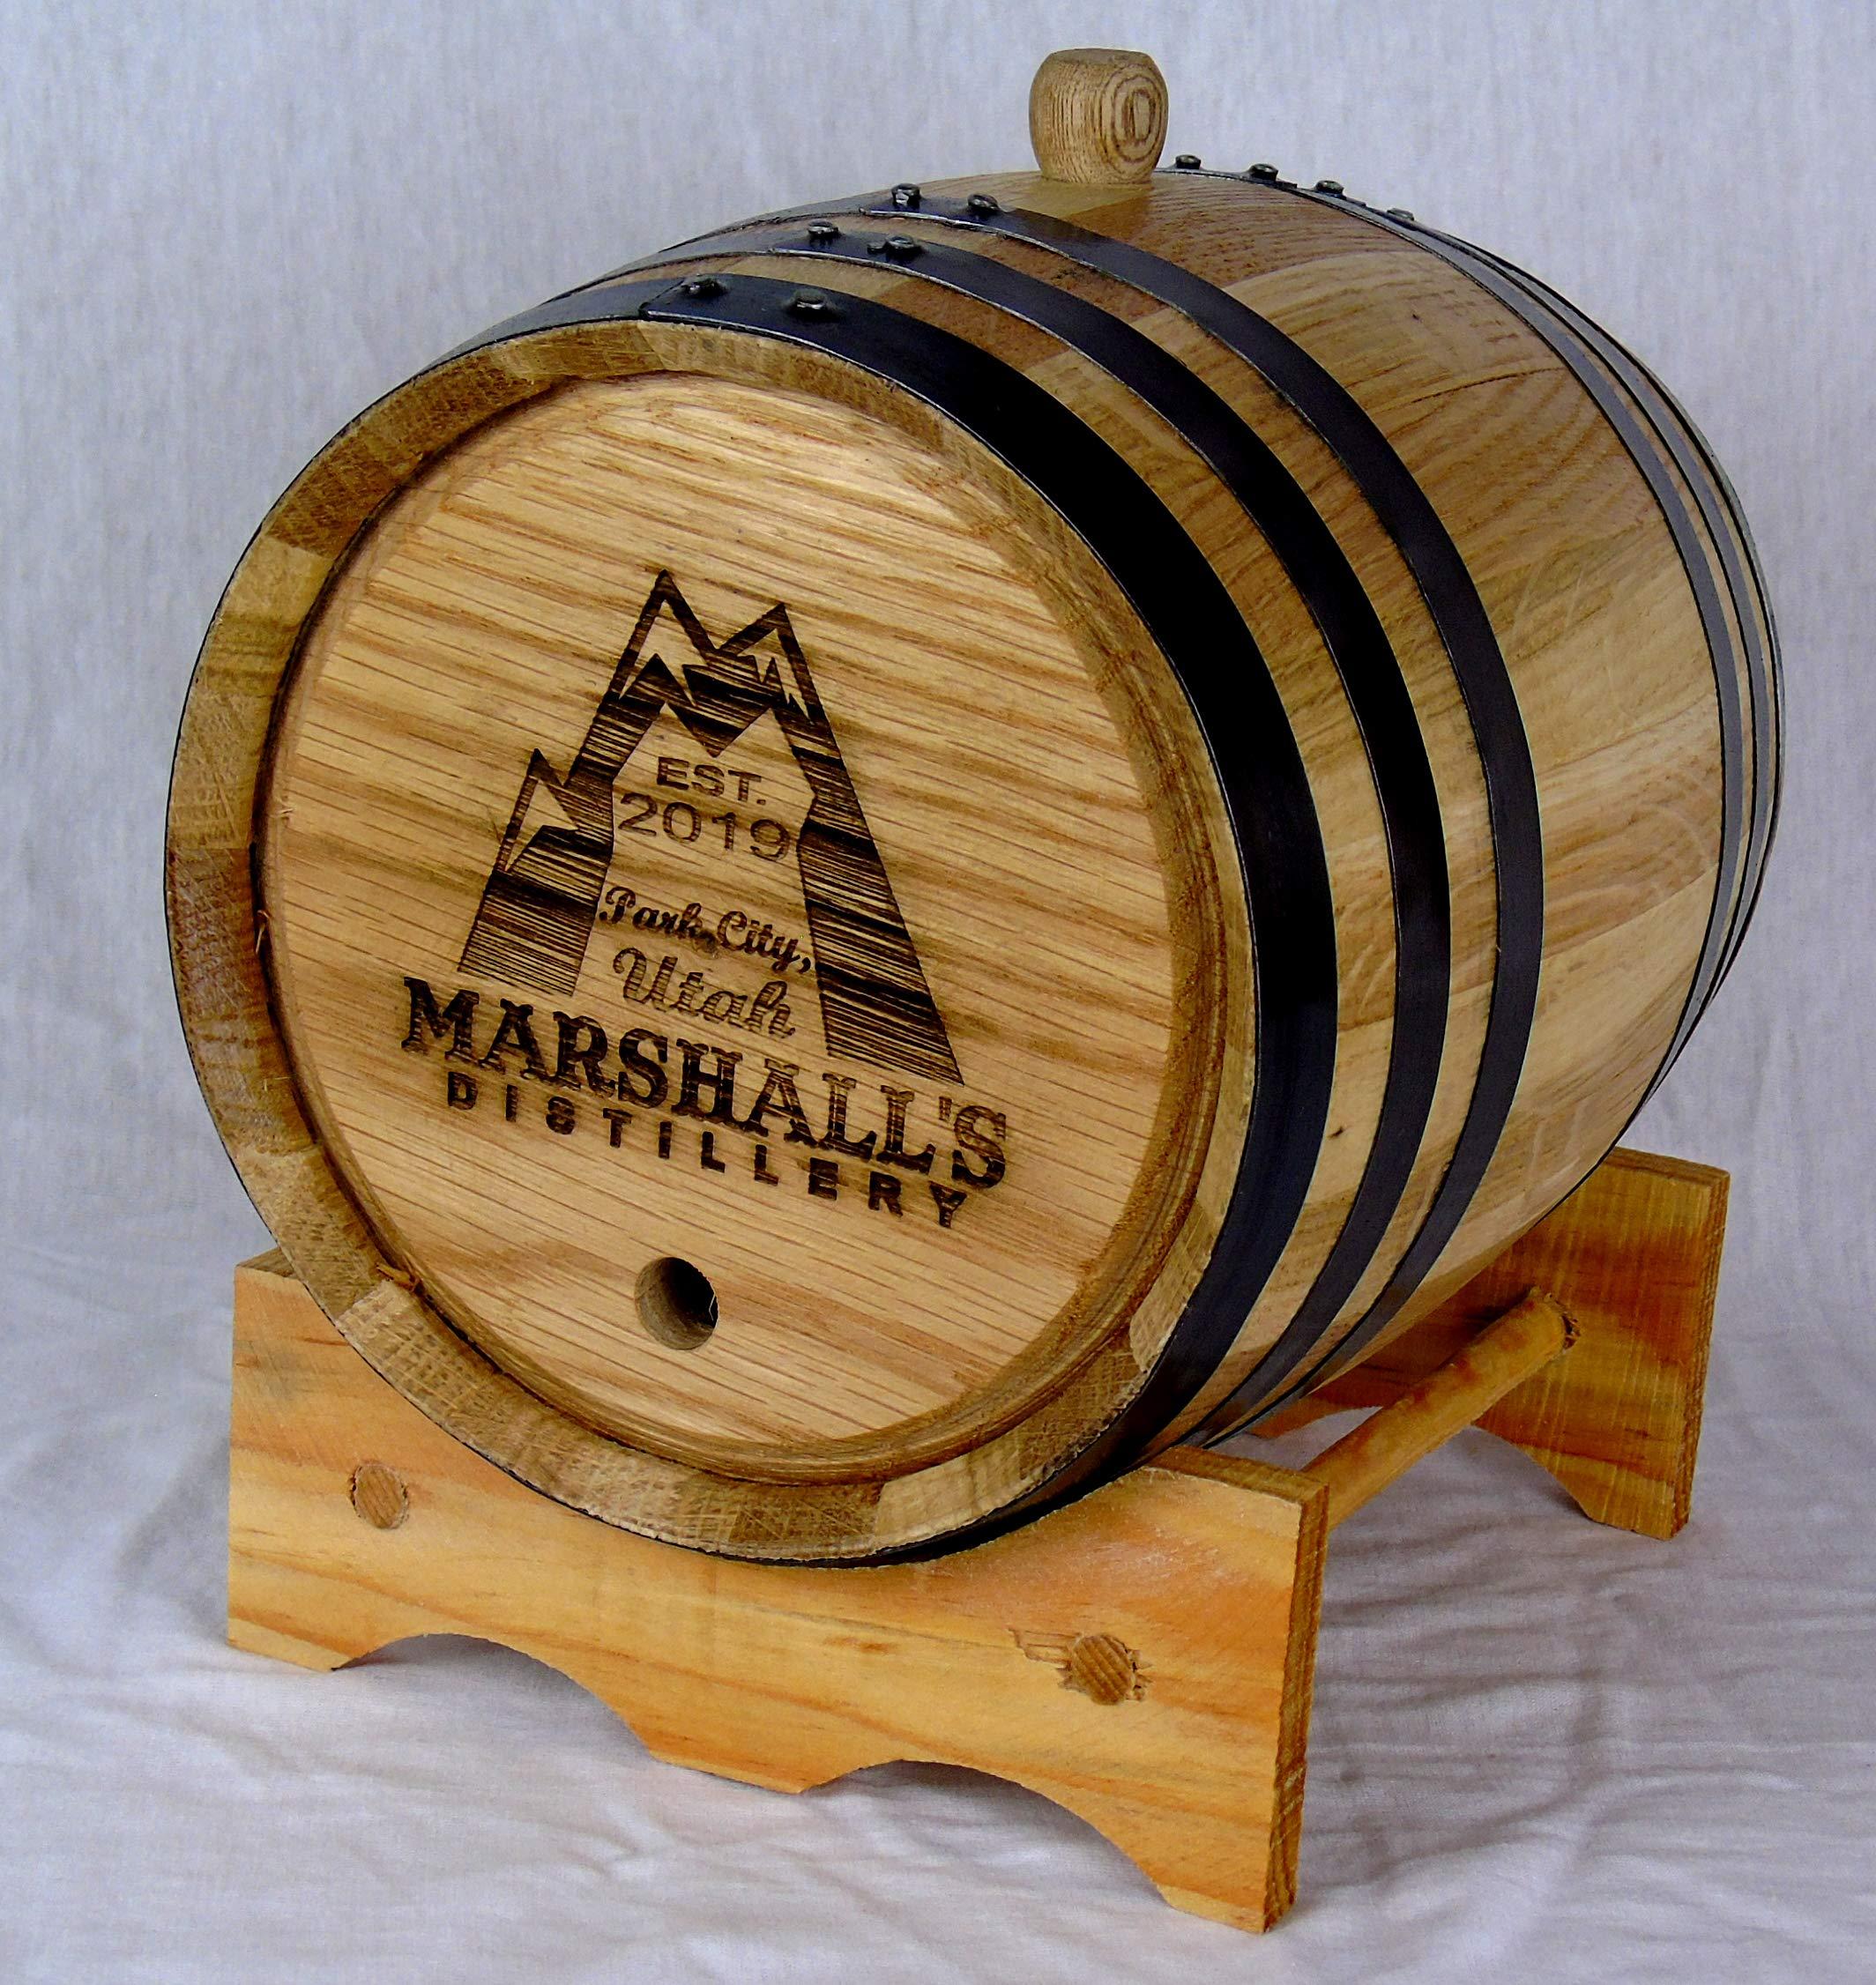 Personalized Engraved White American Oak Aging Barrels RHB133 (1 Liter)